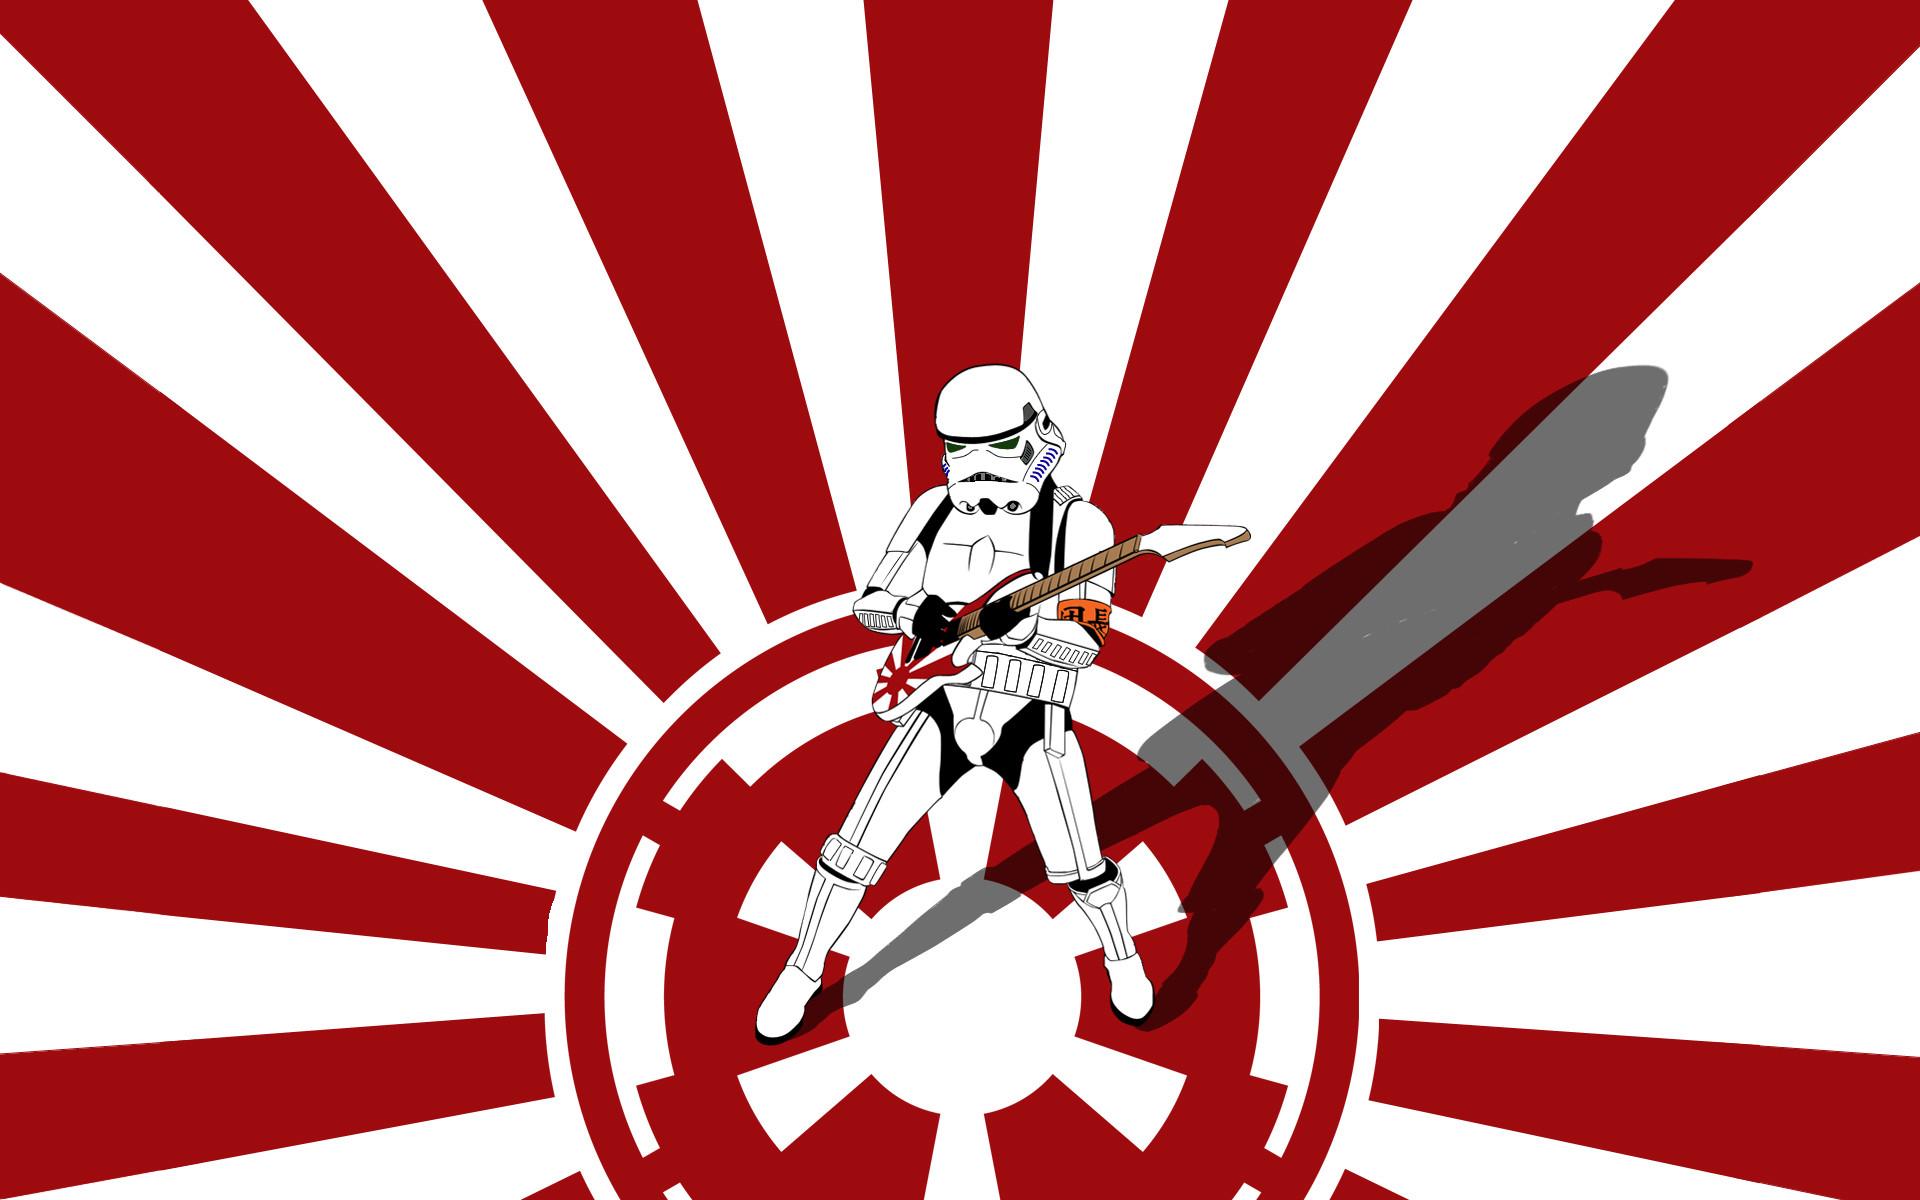 Galactic Empire Guitars Star Wars Stormtroopers; galactic empire logos …